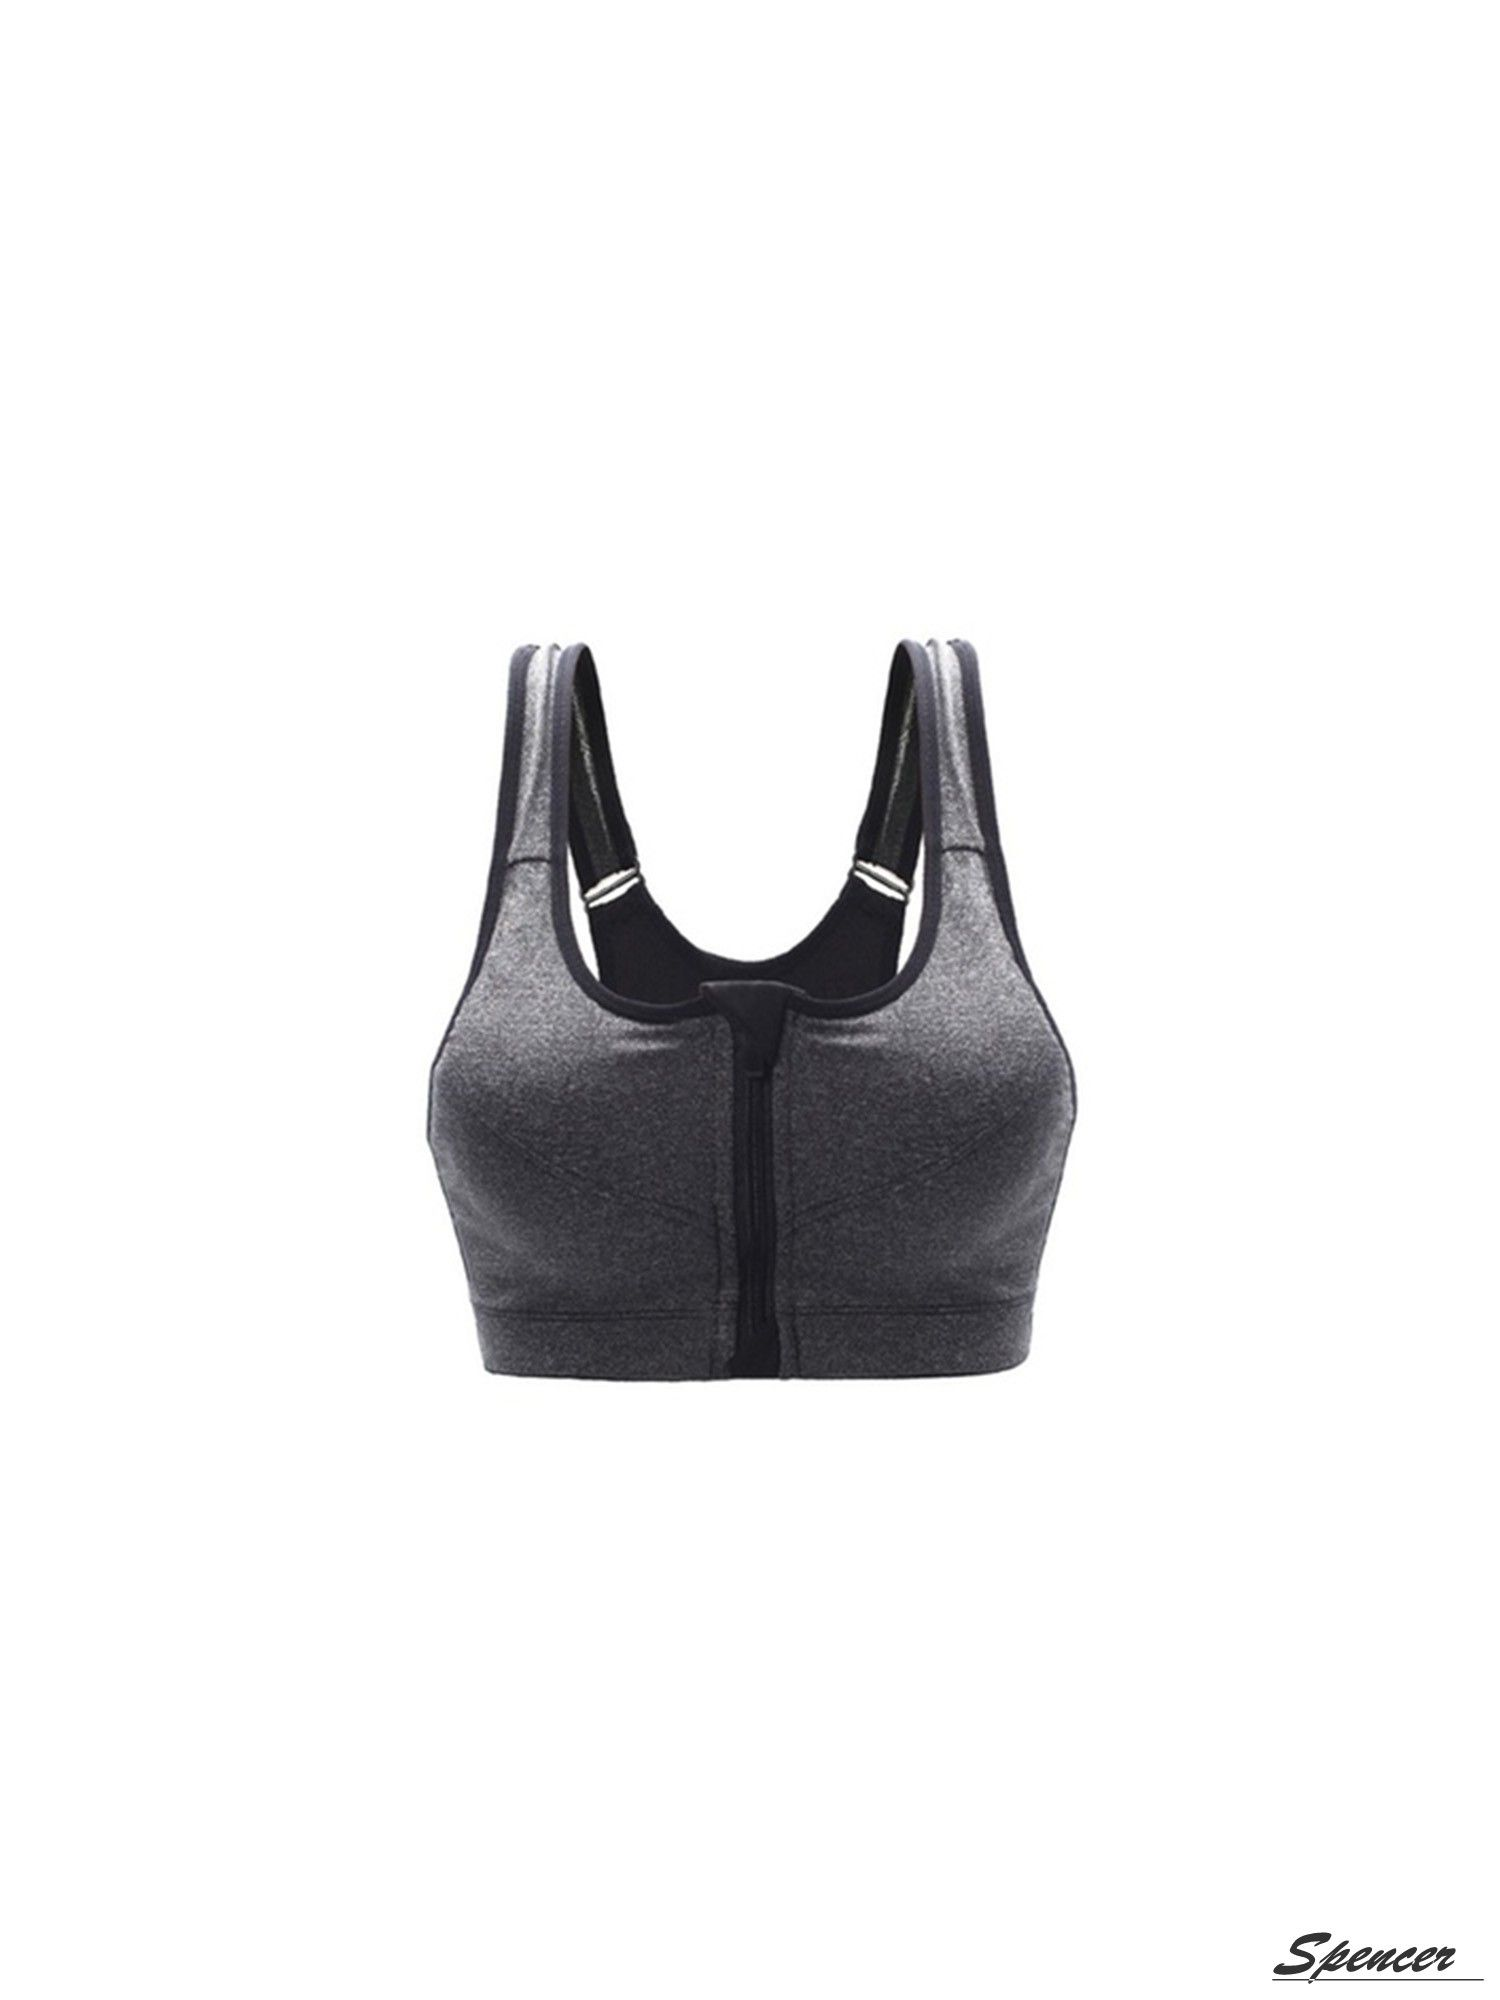 53d55c2b46 Spencer Womens Padded Sports Bra Yoga Front Zip High Impact Bra Seamless  Tank Top Underwear(